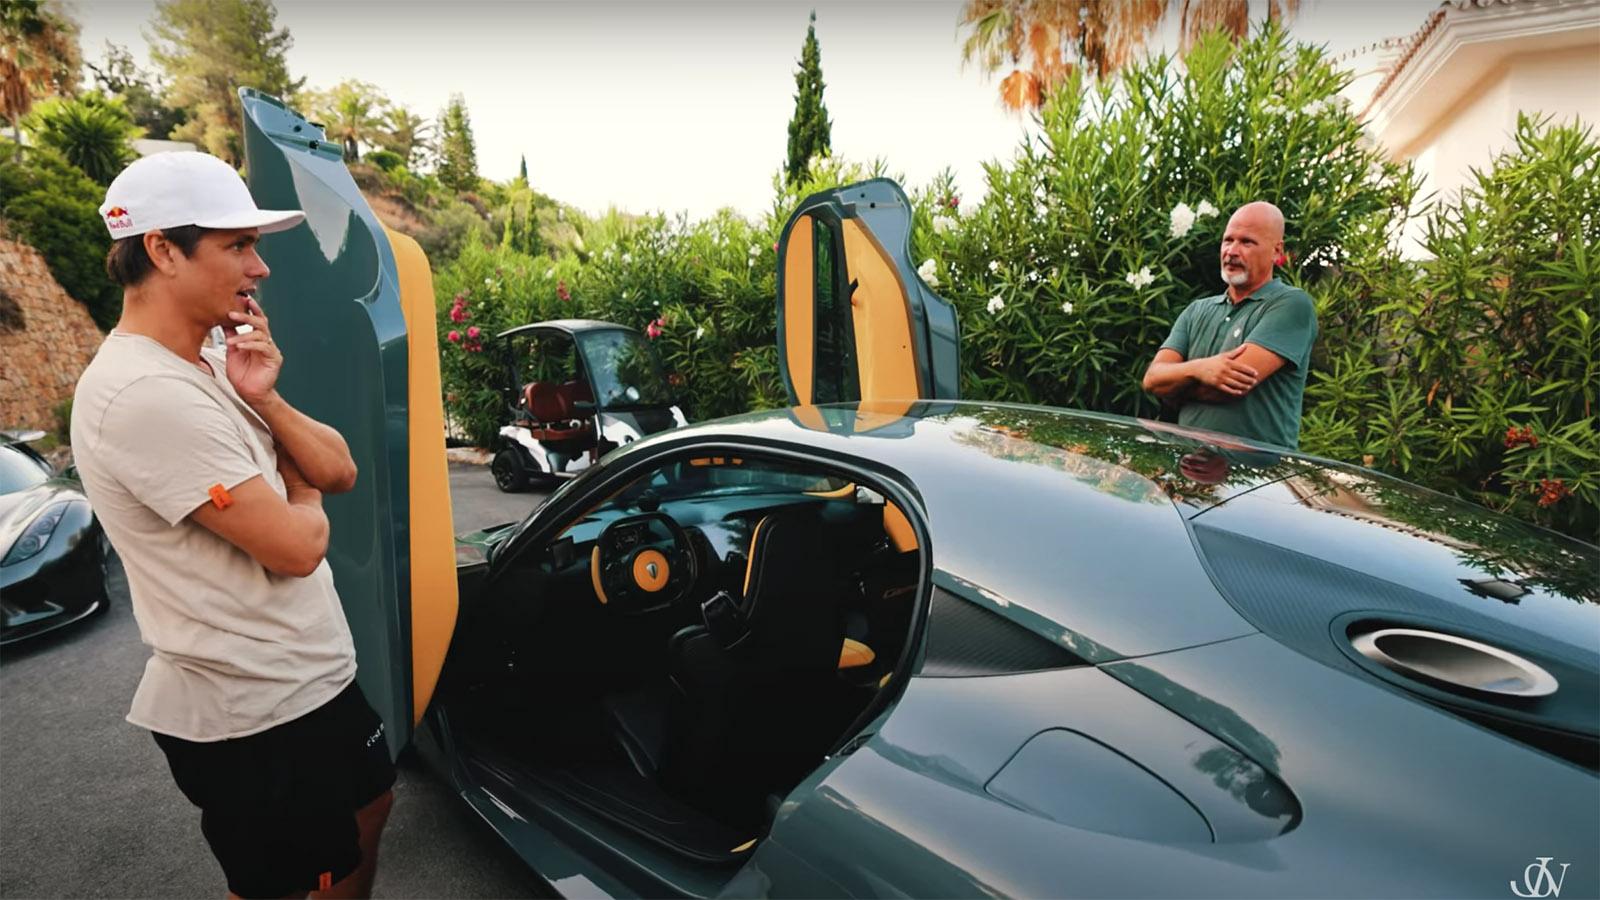 Jon Olsson with Koenigsegg Gemera